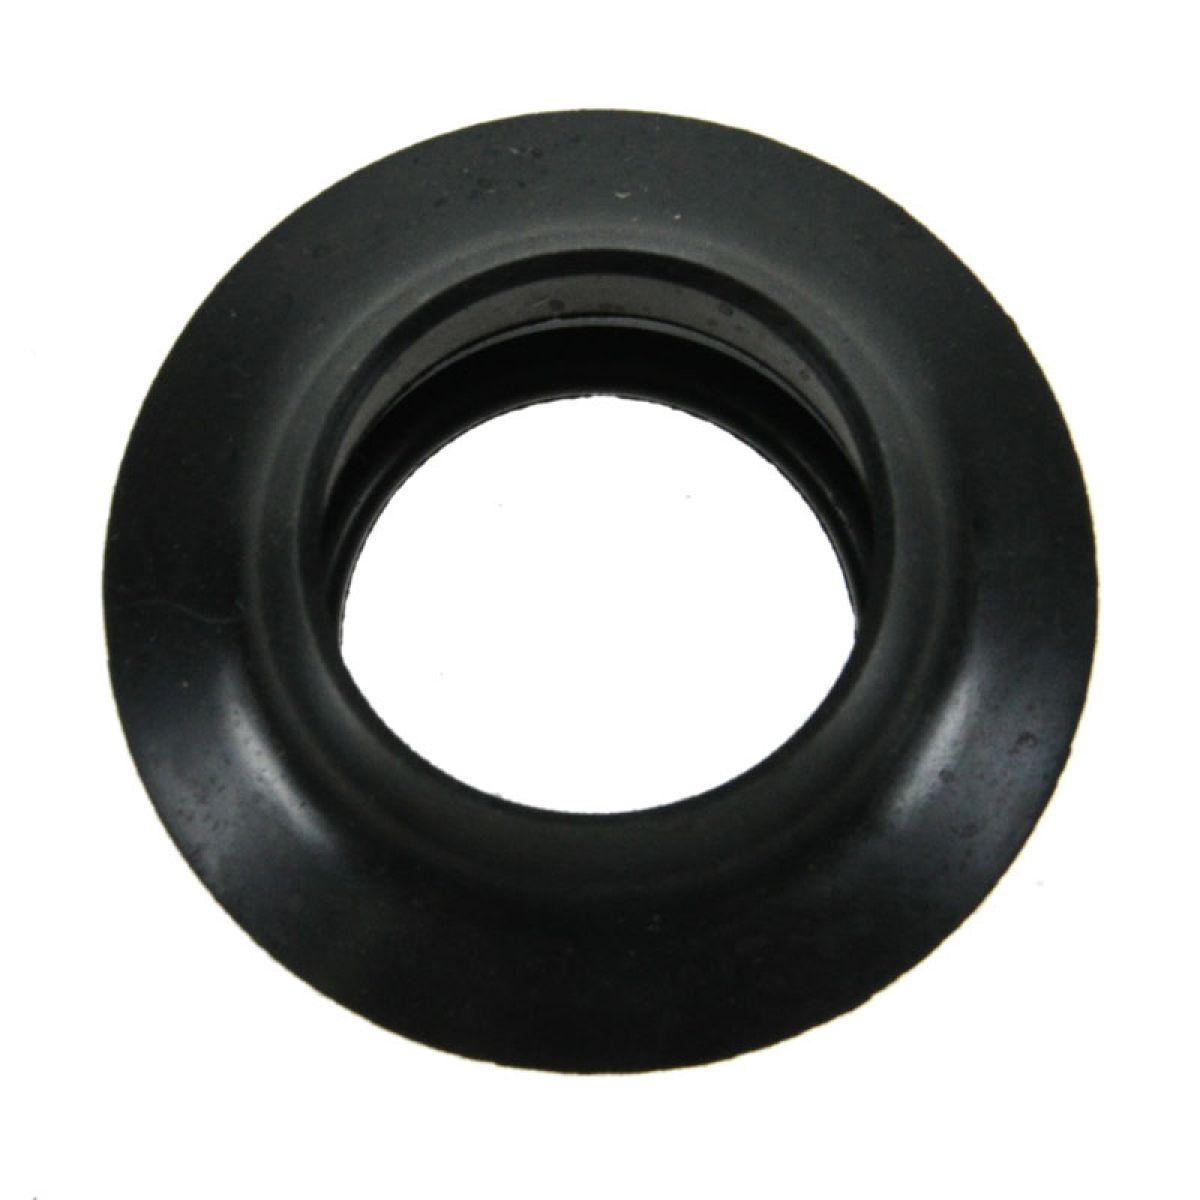 hight resolution of dorman fuel gas tank filler neck grommet seal for chrysler dodge plymouth